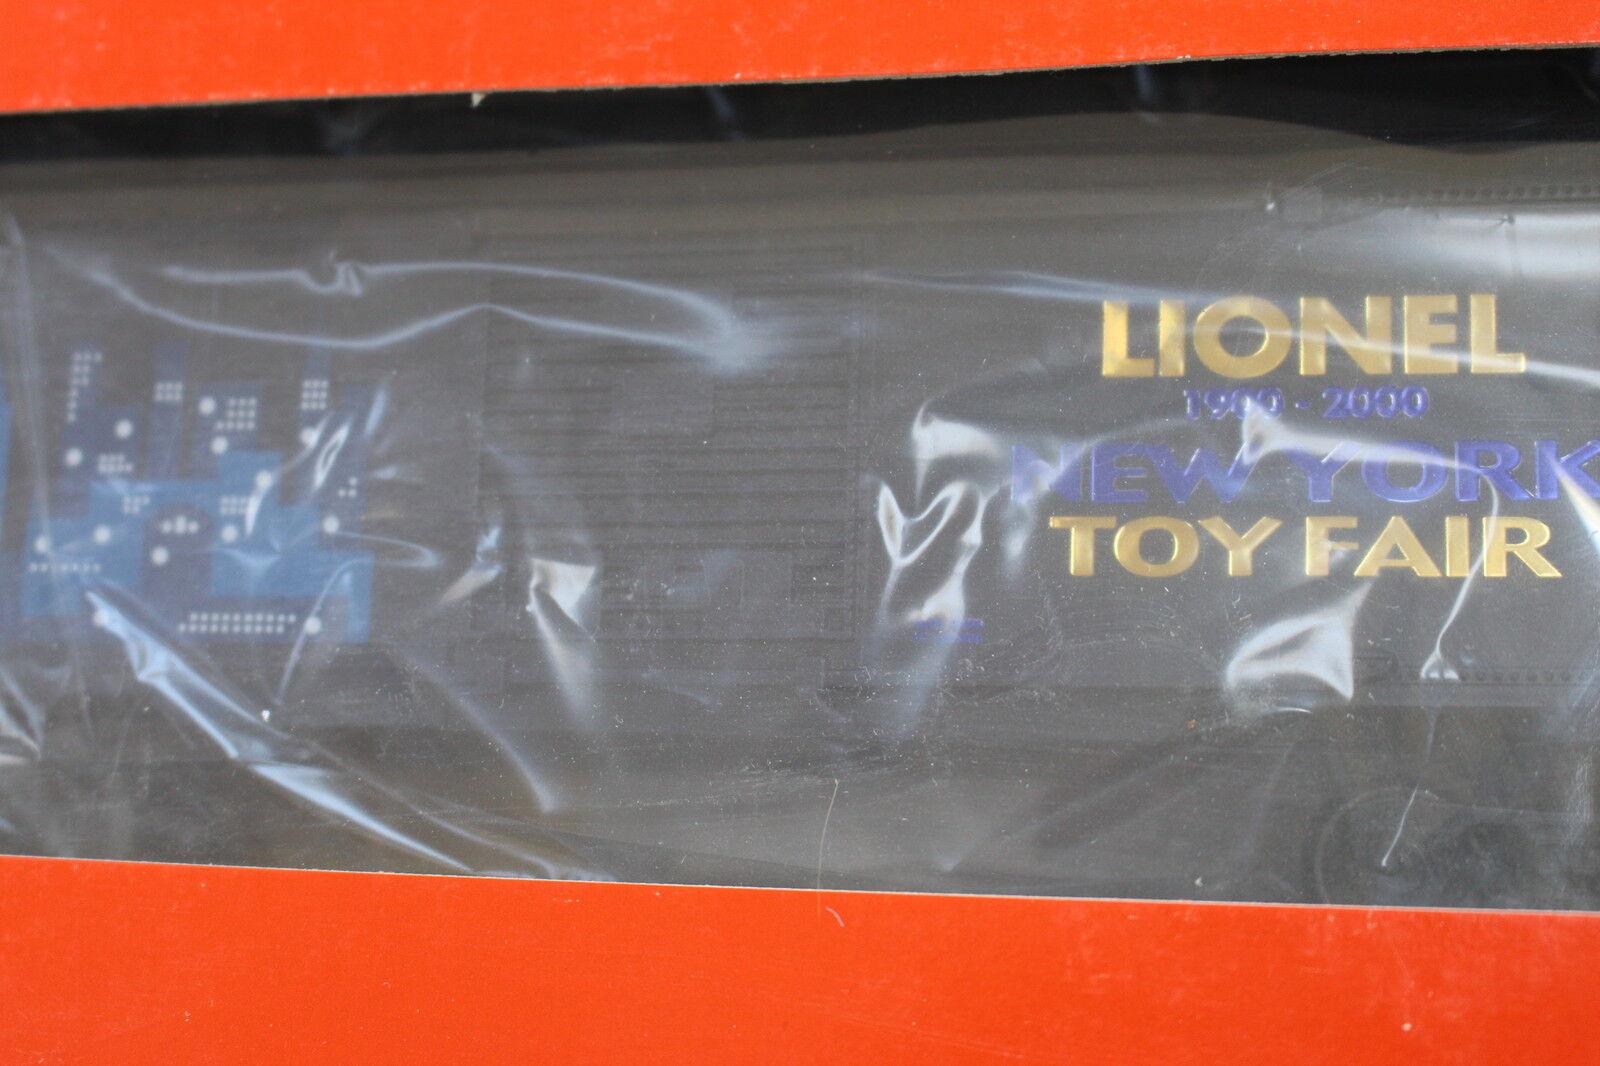 2000 Lionel 6-19989 2000 Toy Fair Box Car L2667